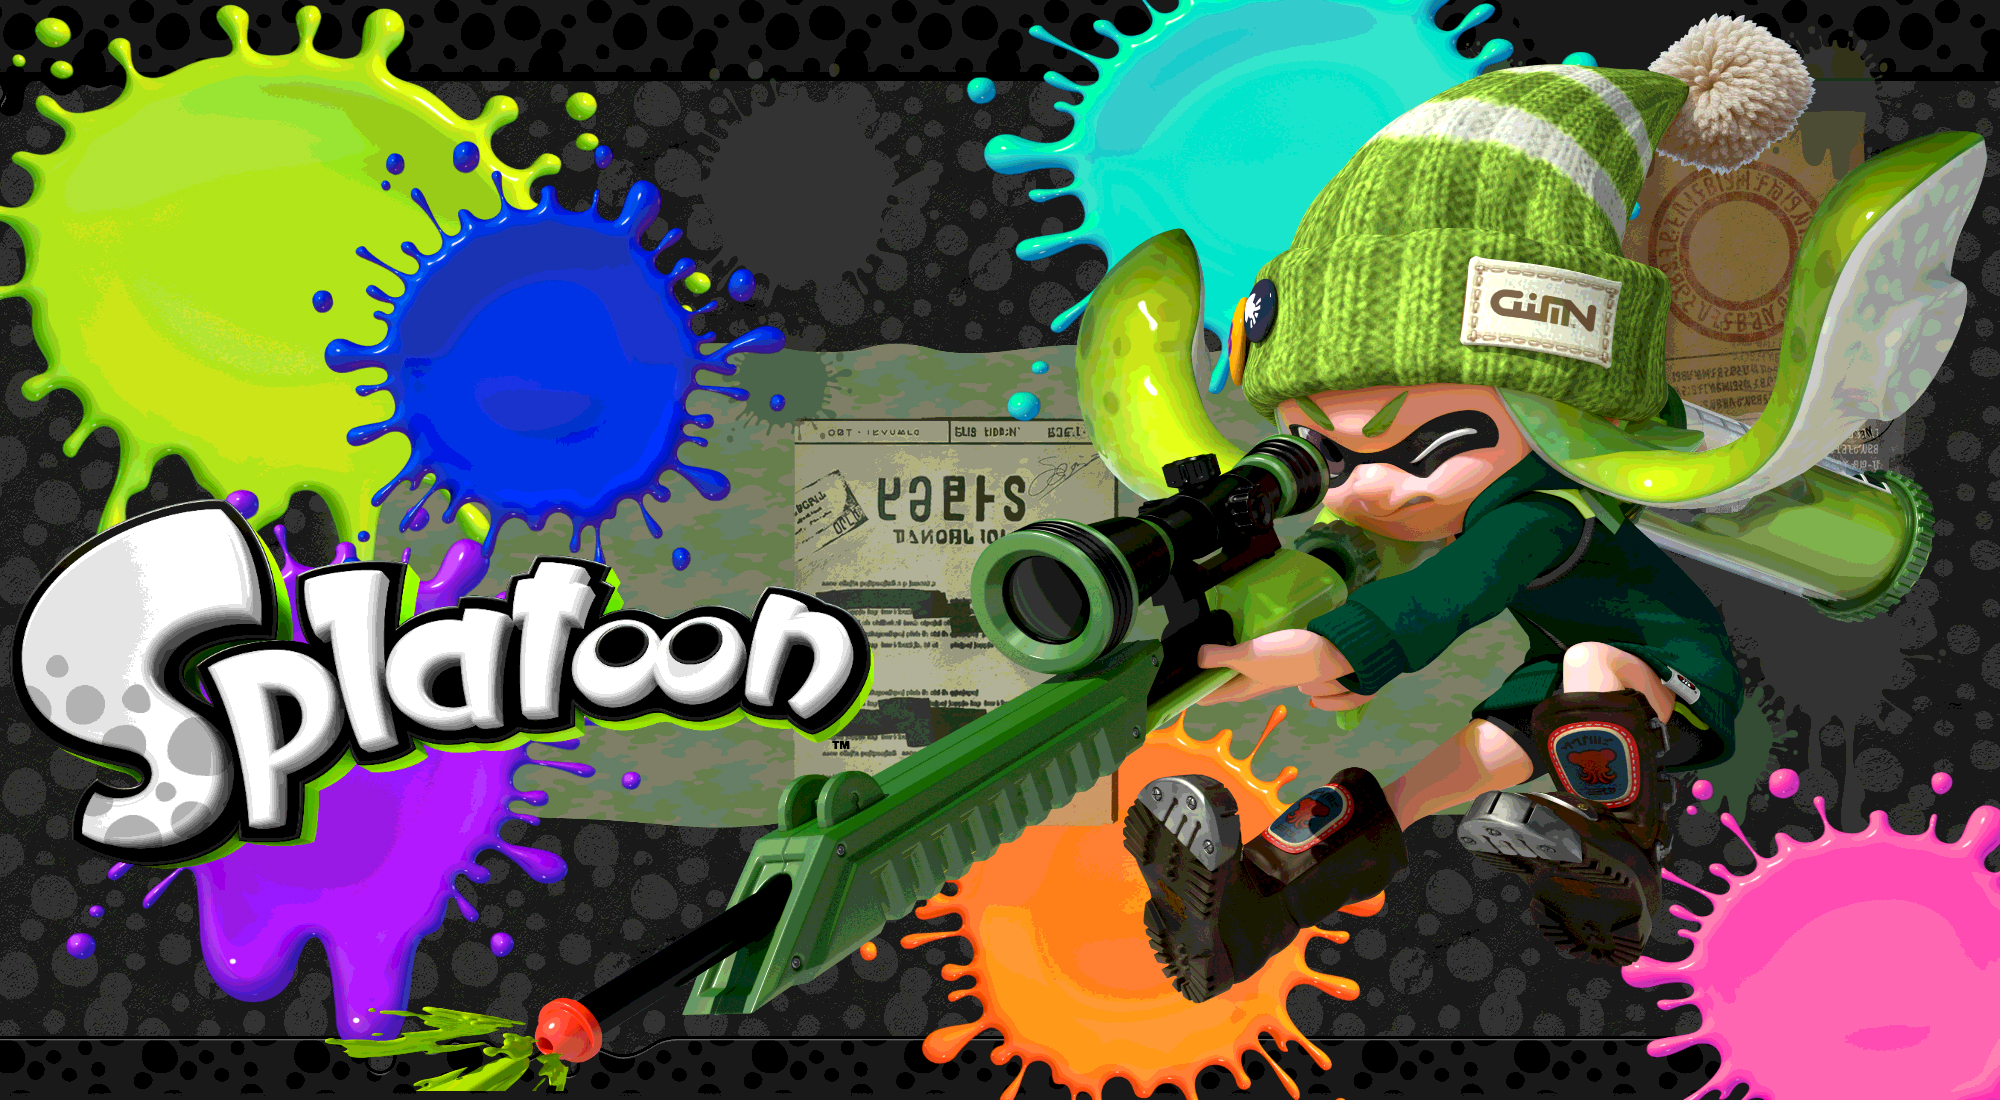 Splatoon   Green Inkling Girl Wallpaper by DaKidGaming 2000x1100